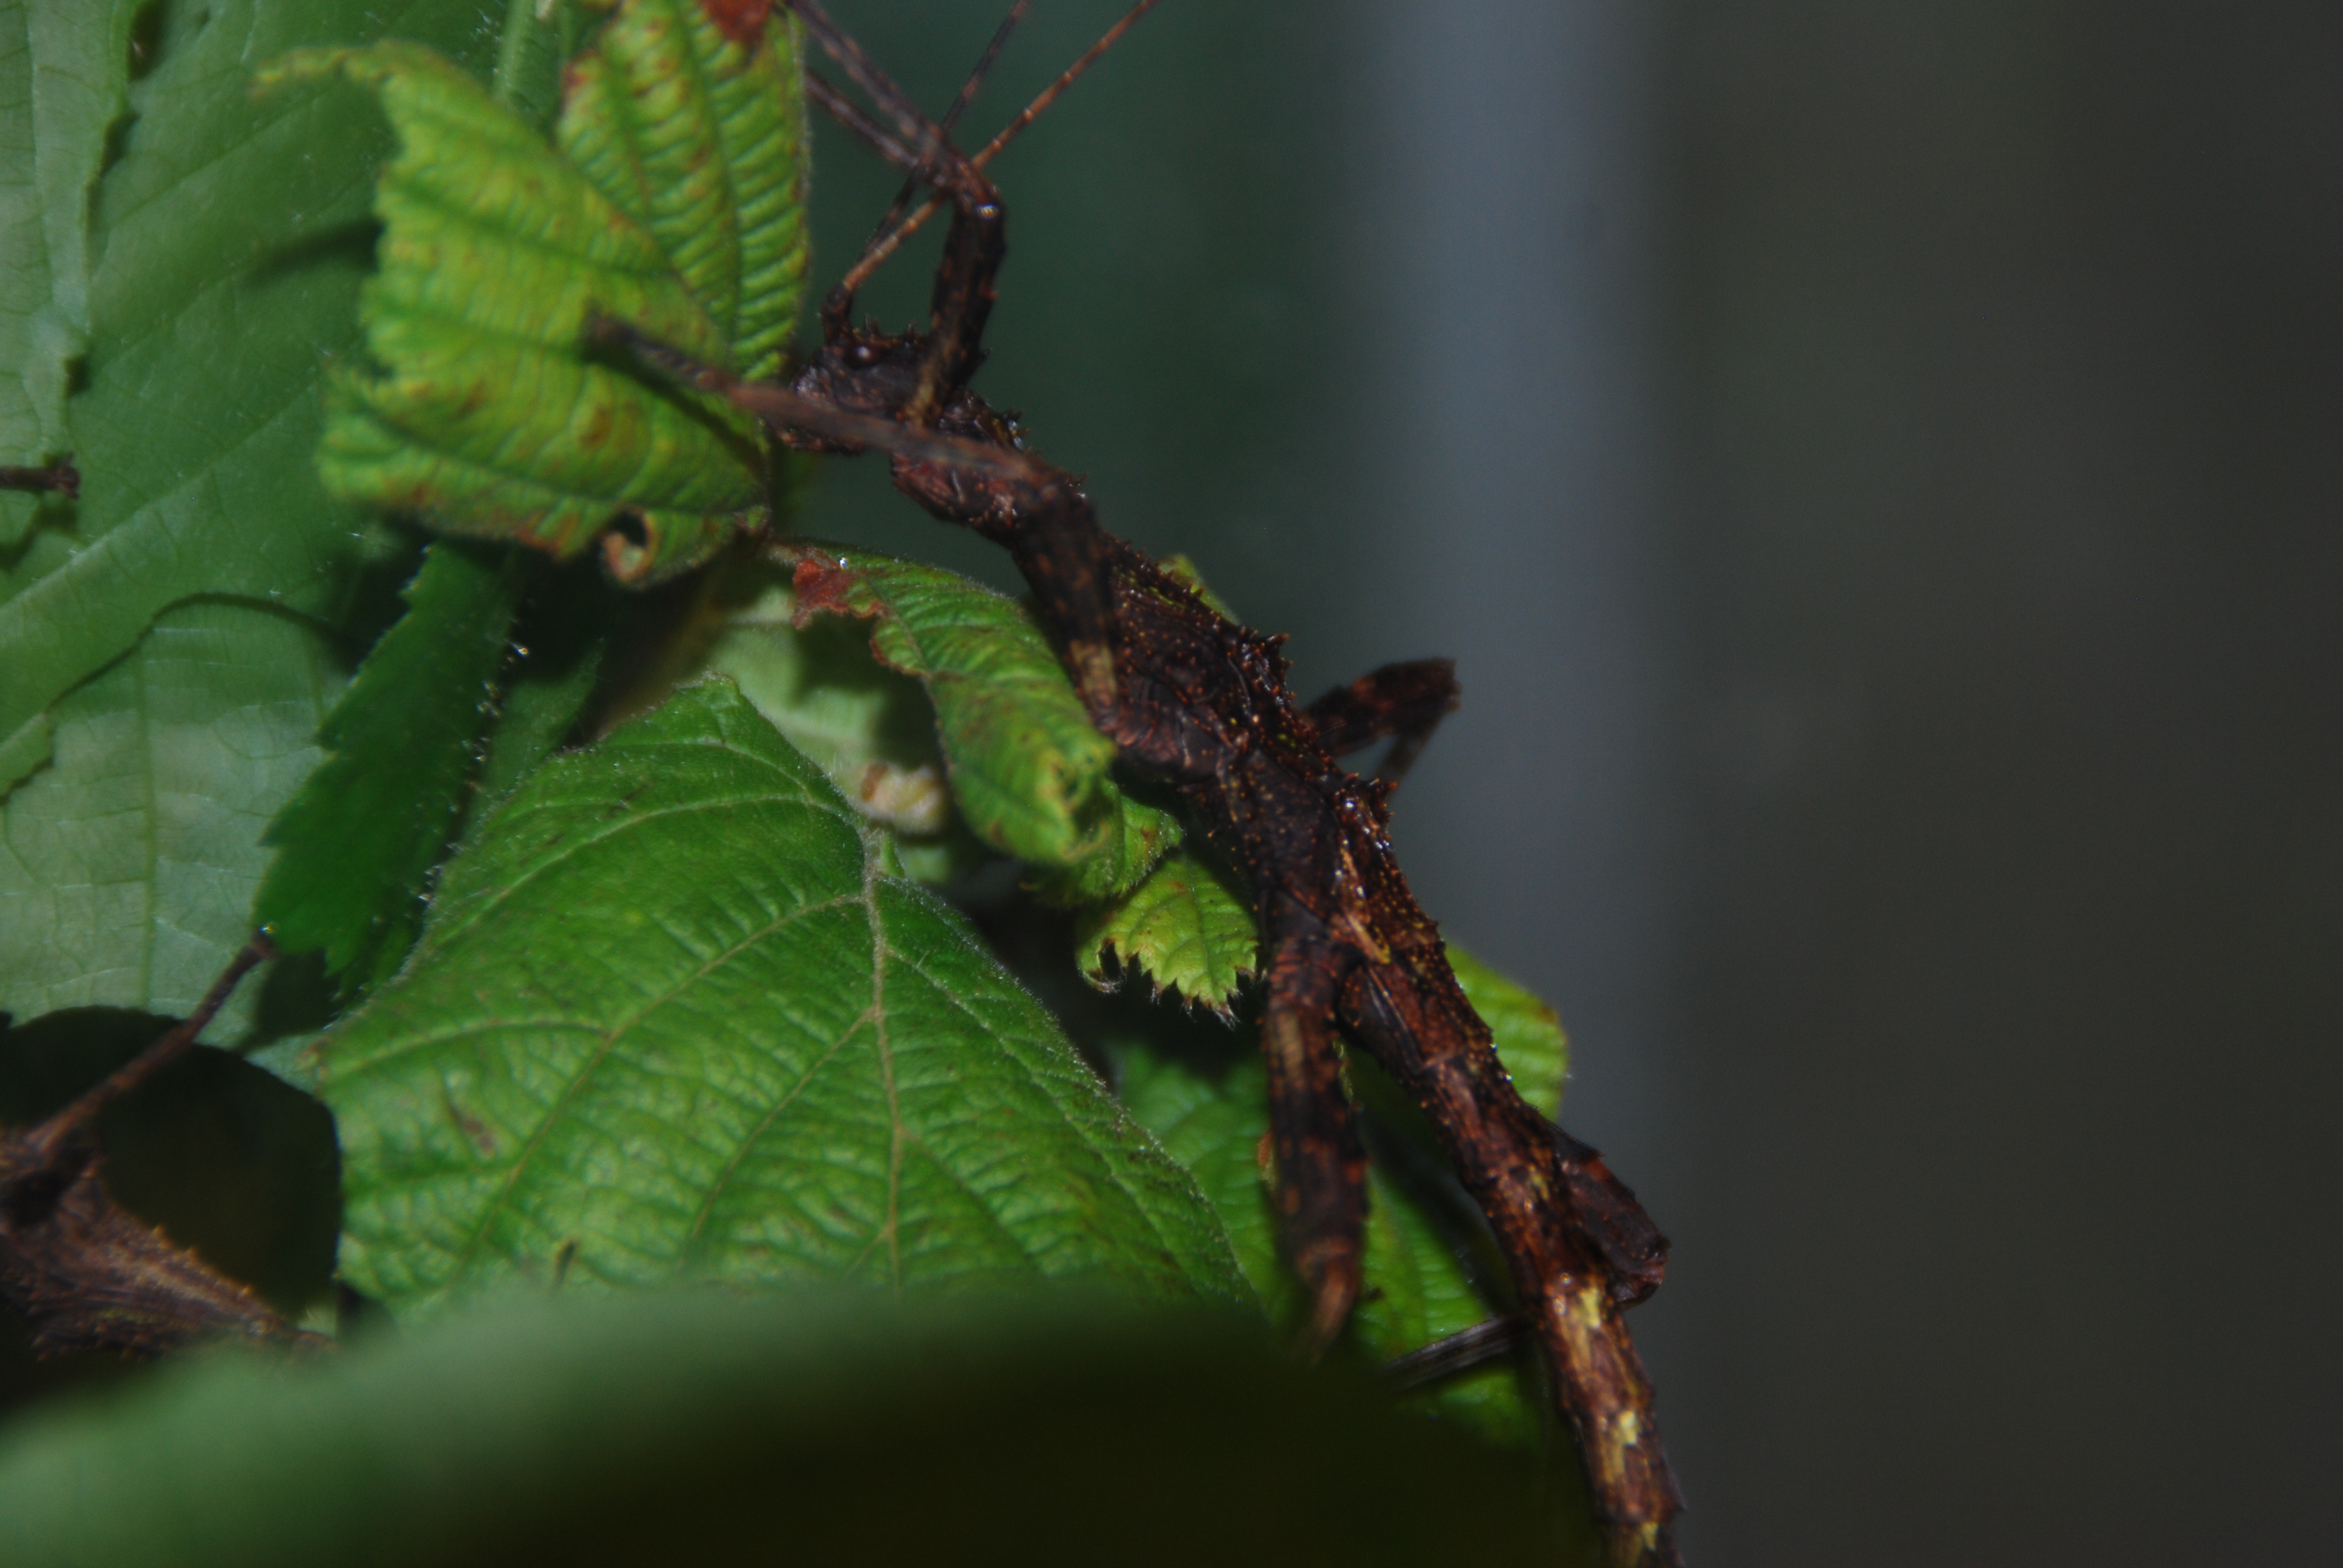 Aretaon asperrimus, Trachyaretaon brueckneri ou autre ??? 269719femelleforme